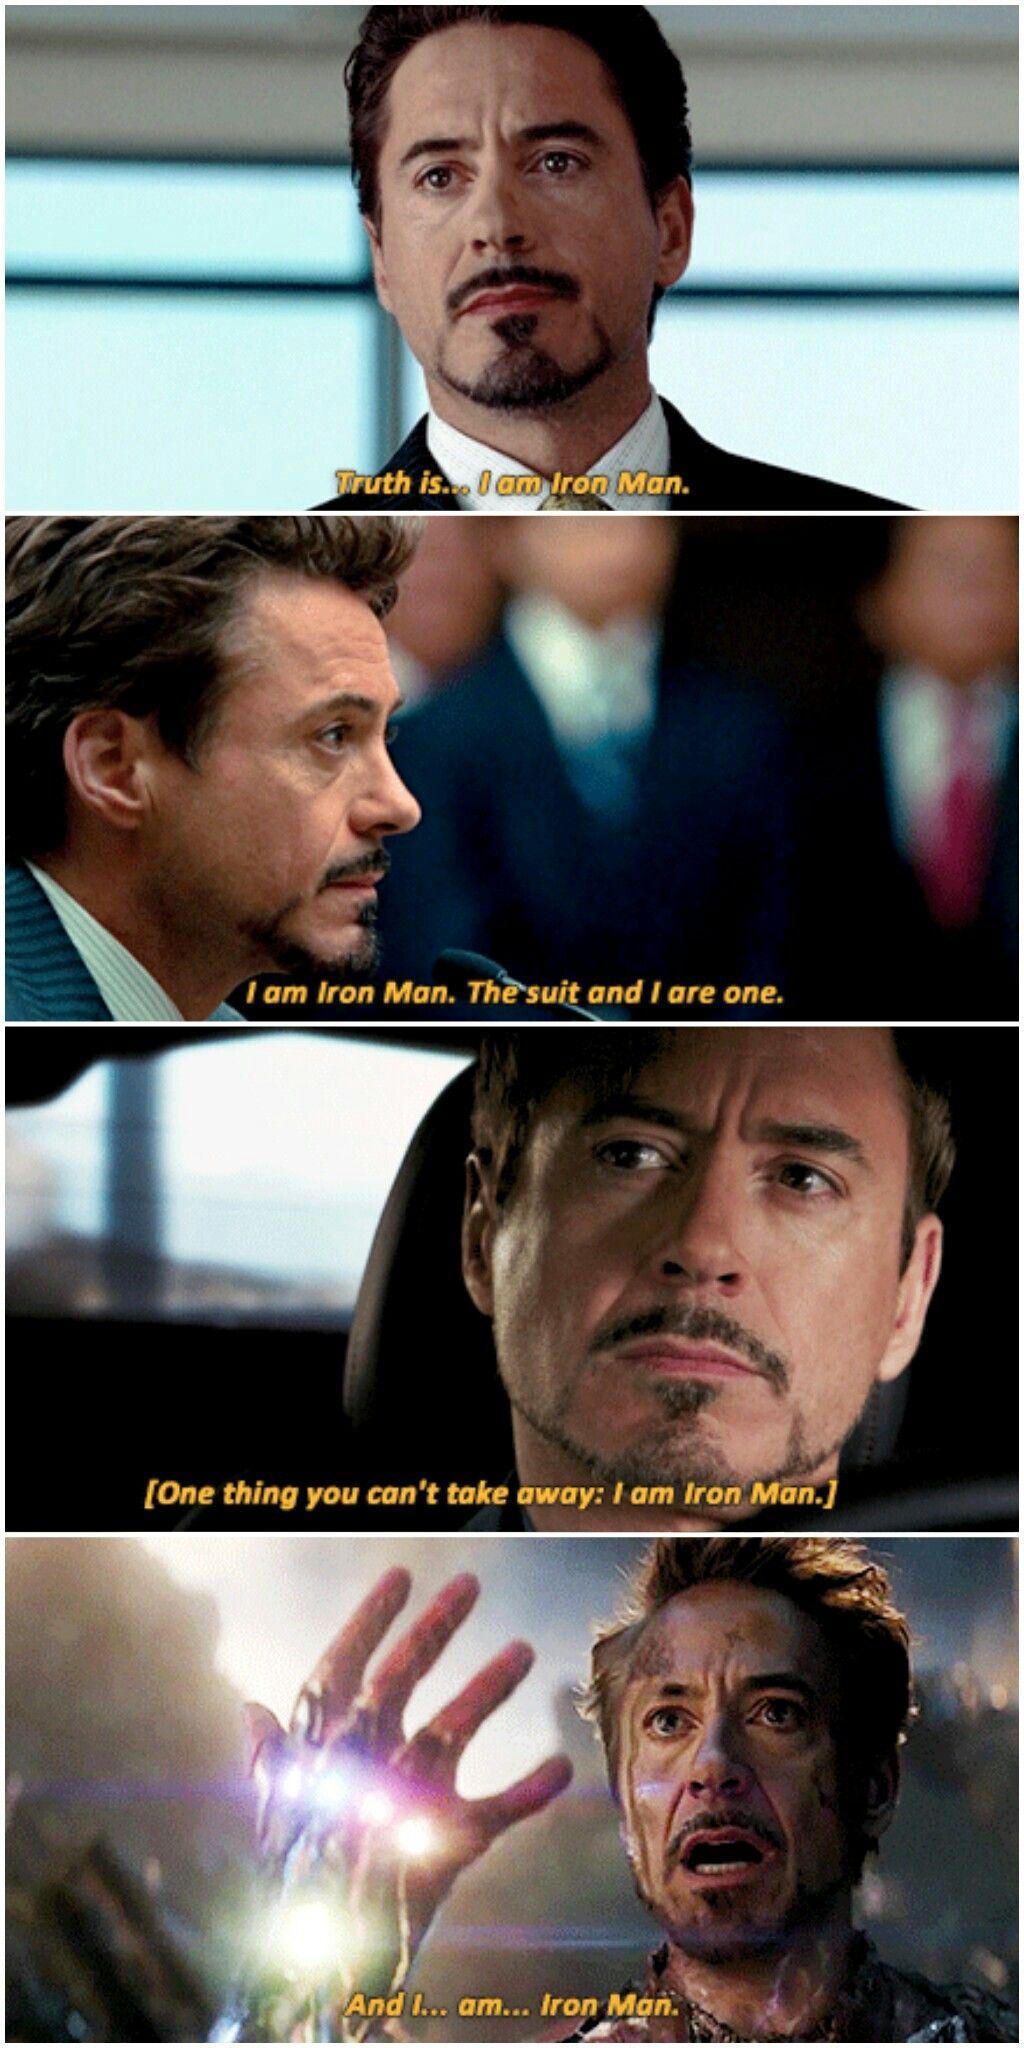 Iron Man 2008 Iron Man 2 2010 Iron Man 3 2013 Avengers Endgame 2019 Tony Stark Marvel Superheroes Iron Man 2008 Marvel Films